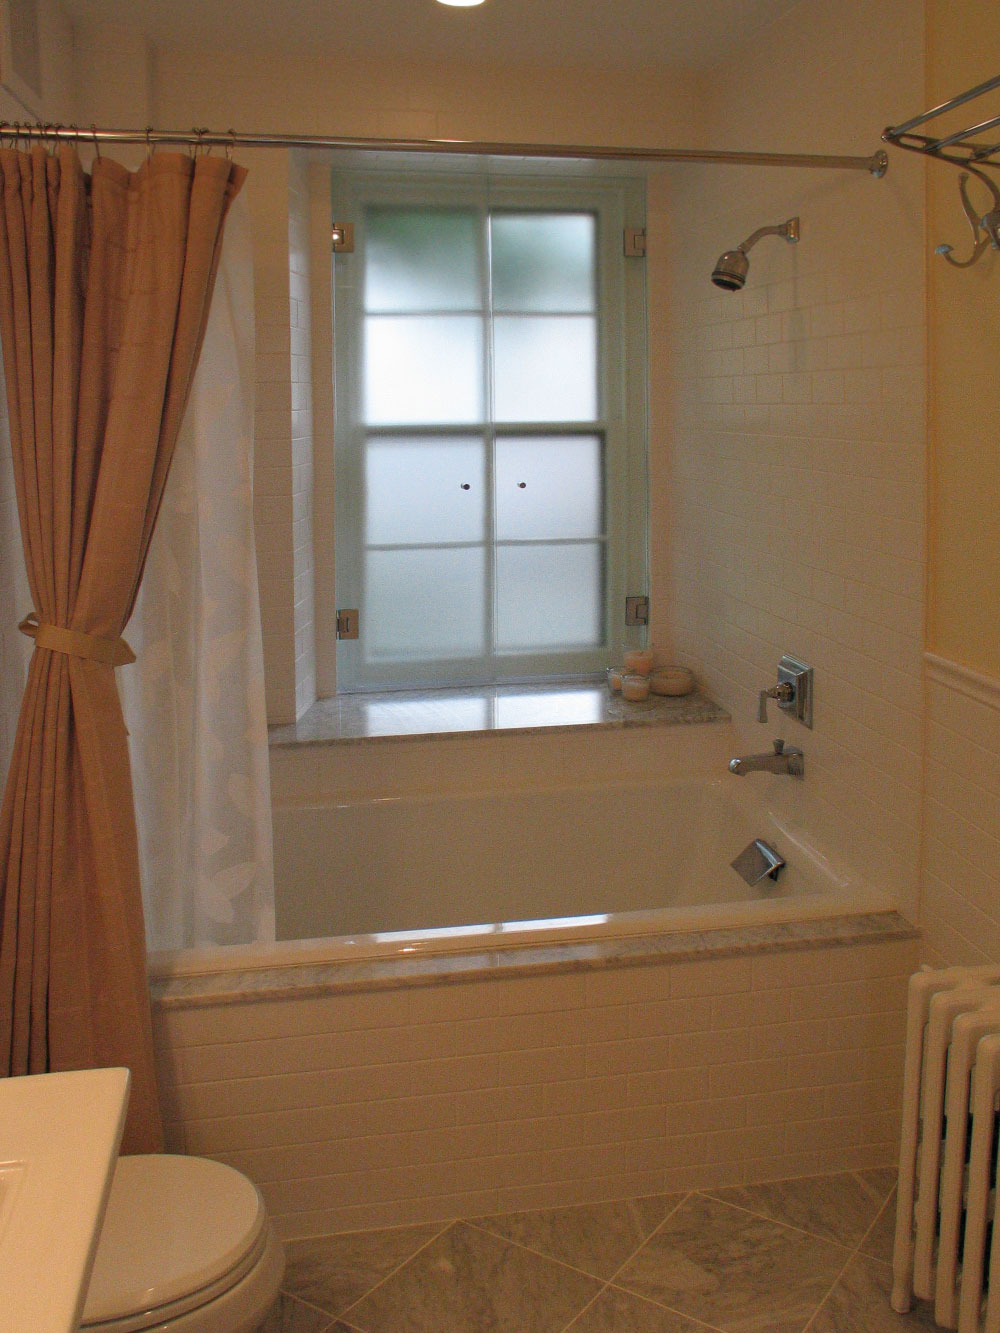 Bathrooms-Tub